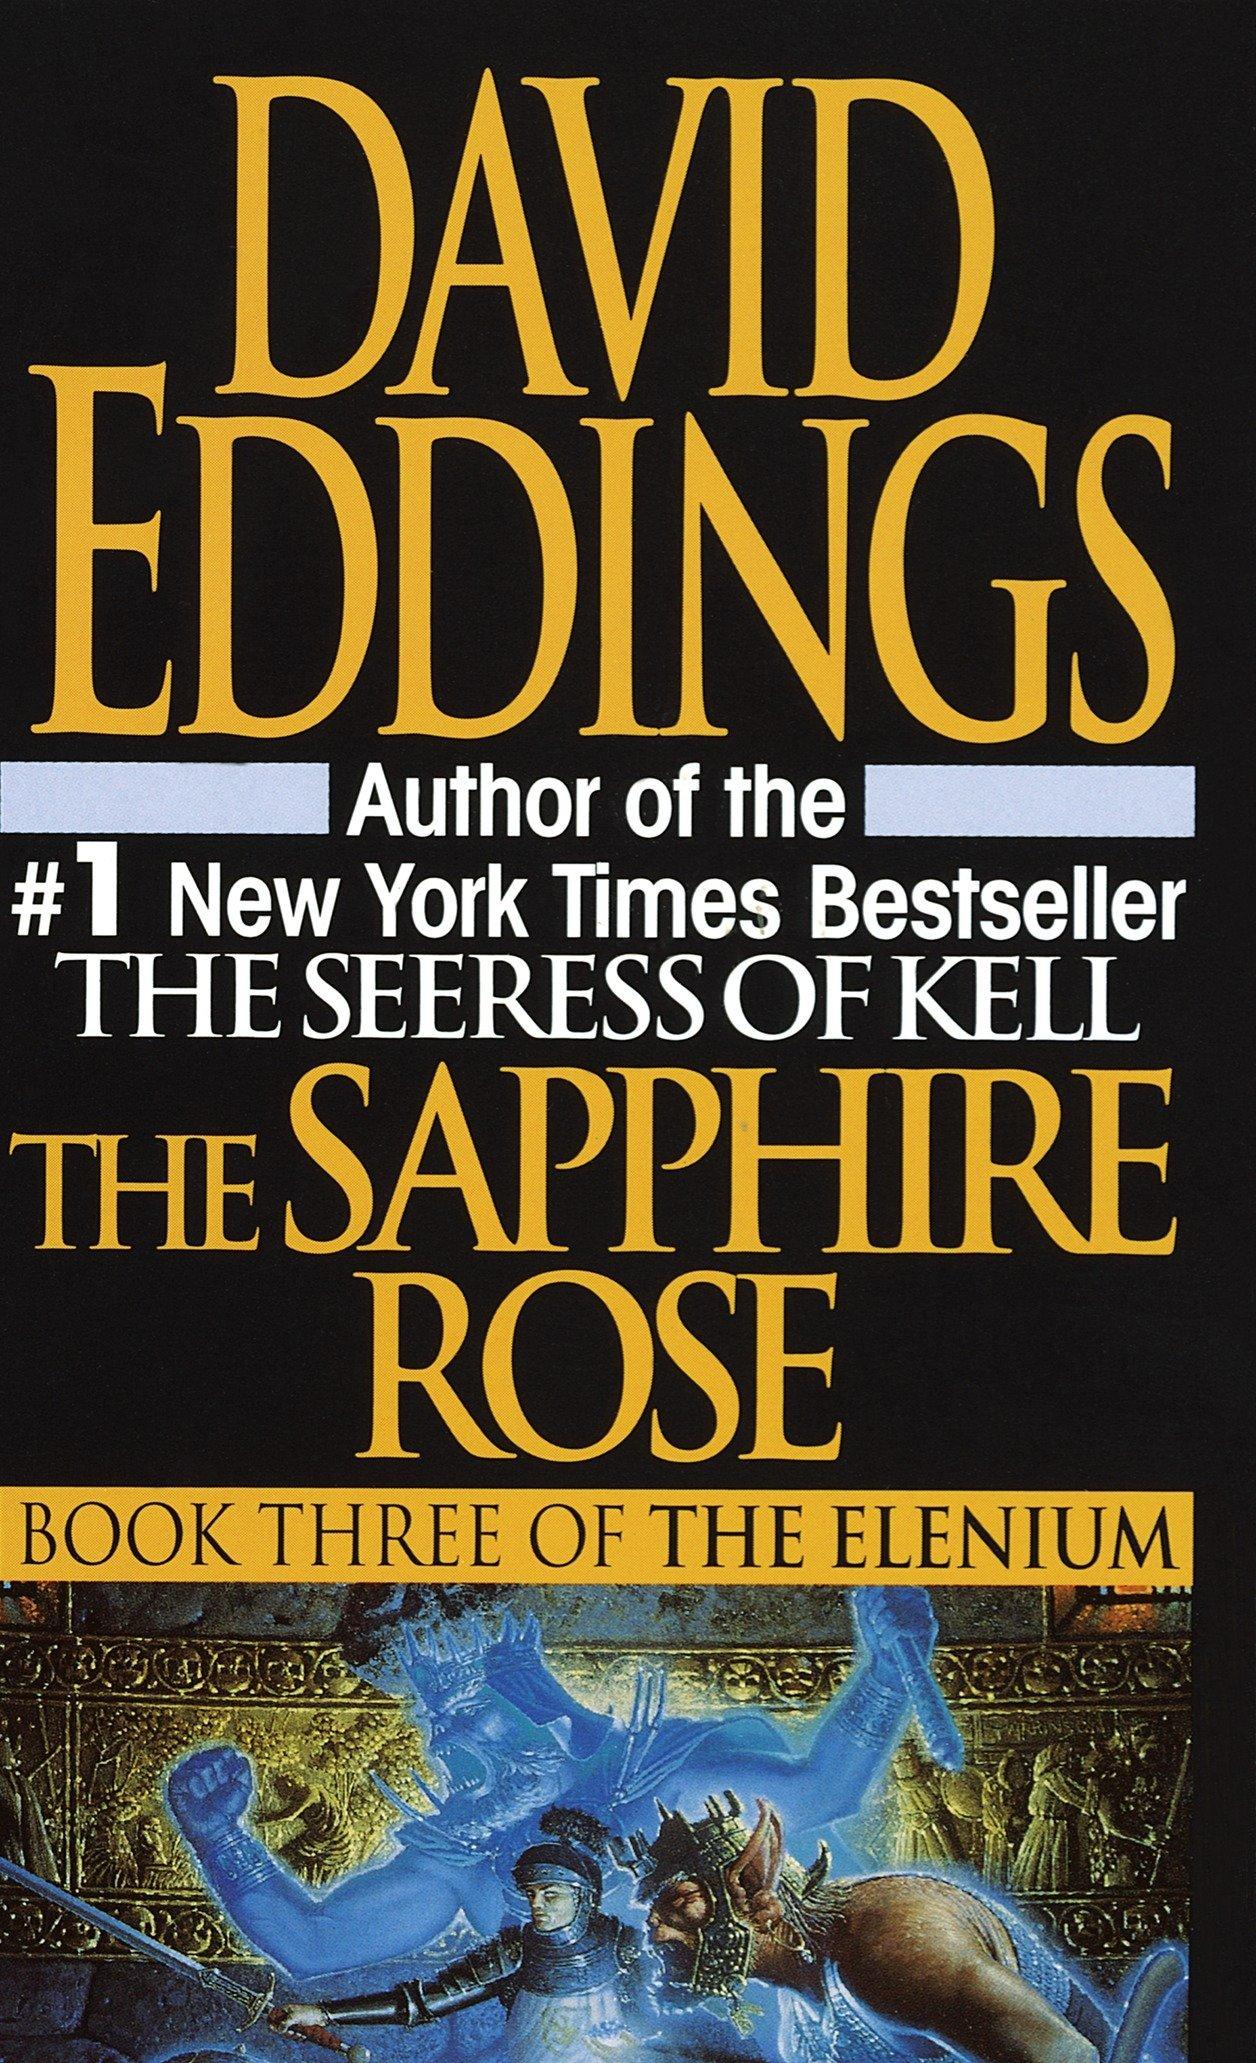 The Sapphire Rose (The Elenium): David Eddings: 9780345374721: Amazon.com:  Books